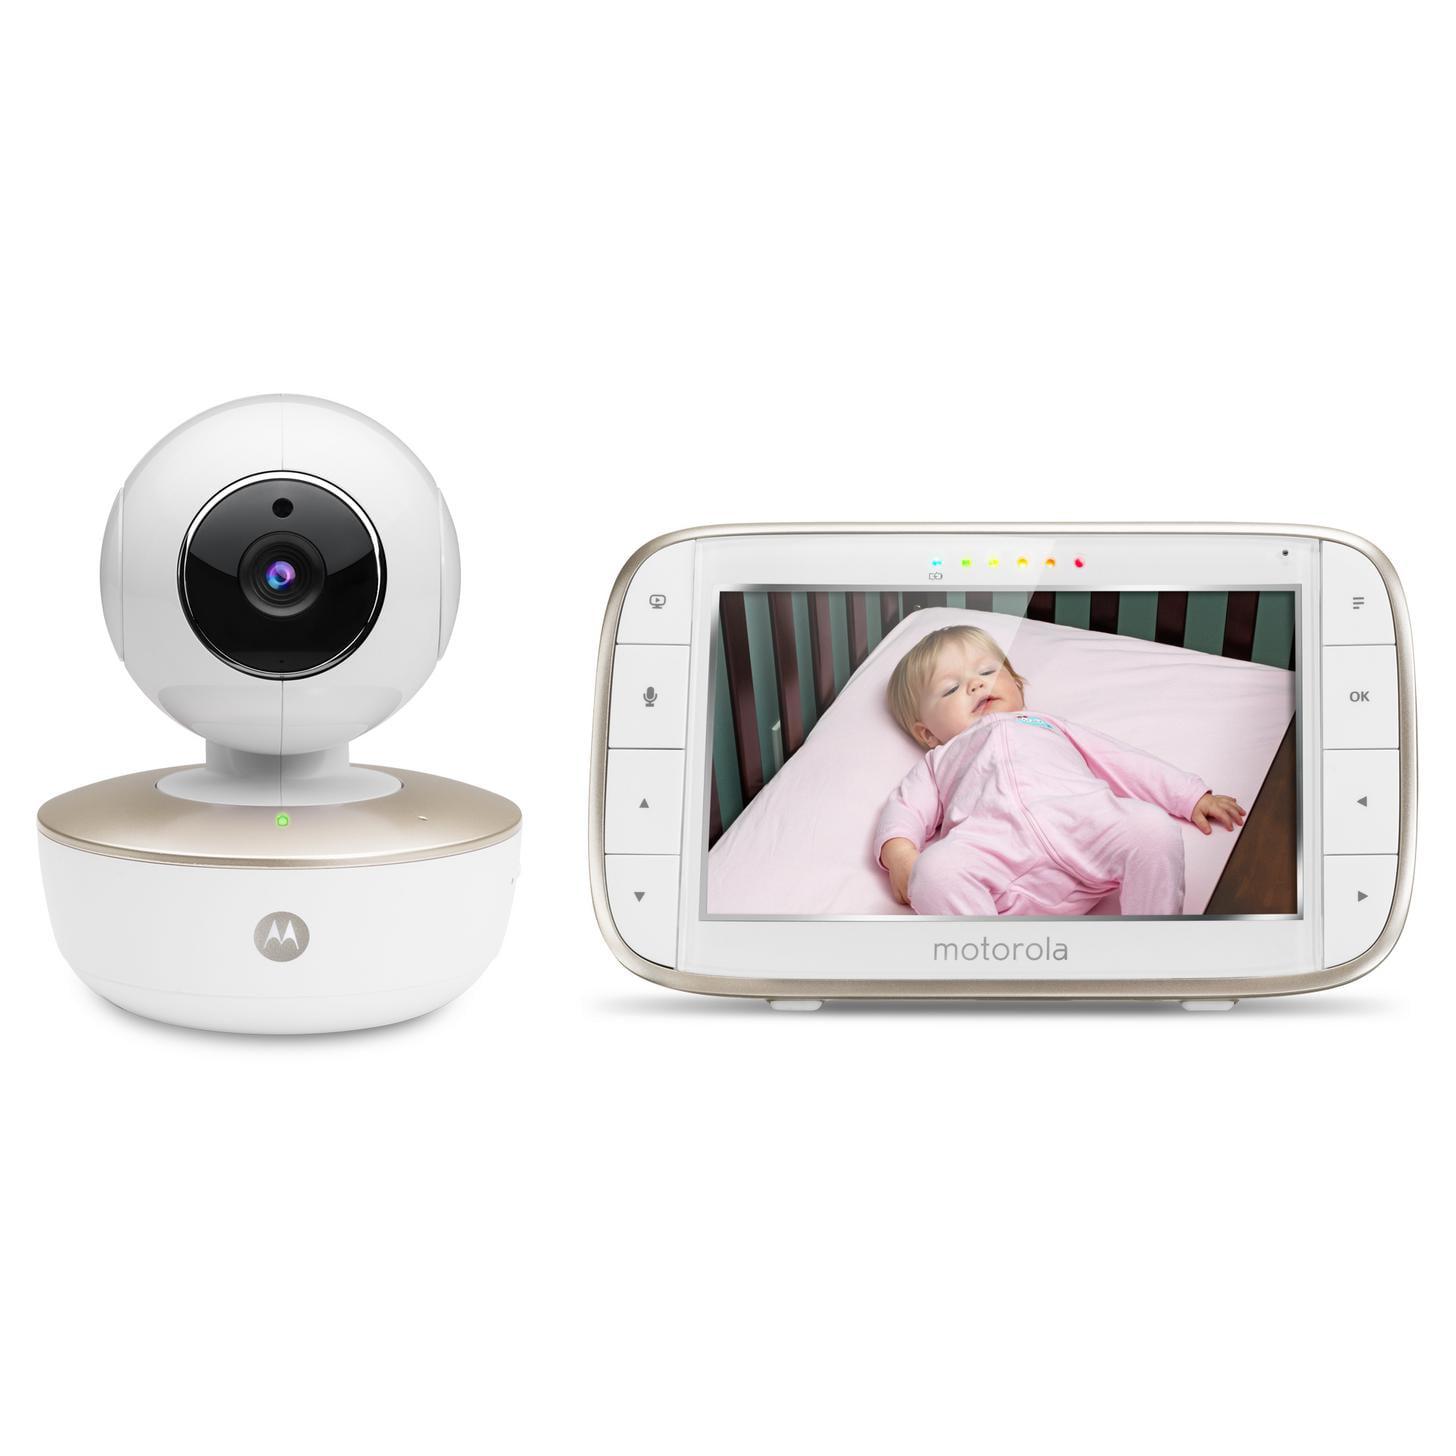 "Motorola MBP855 Connect, Wi-Fi Video Baby Monitor, Portable 5"" Monitor by Motorola"